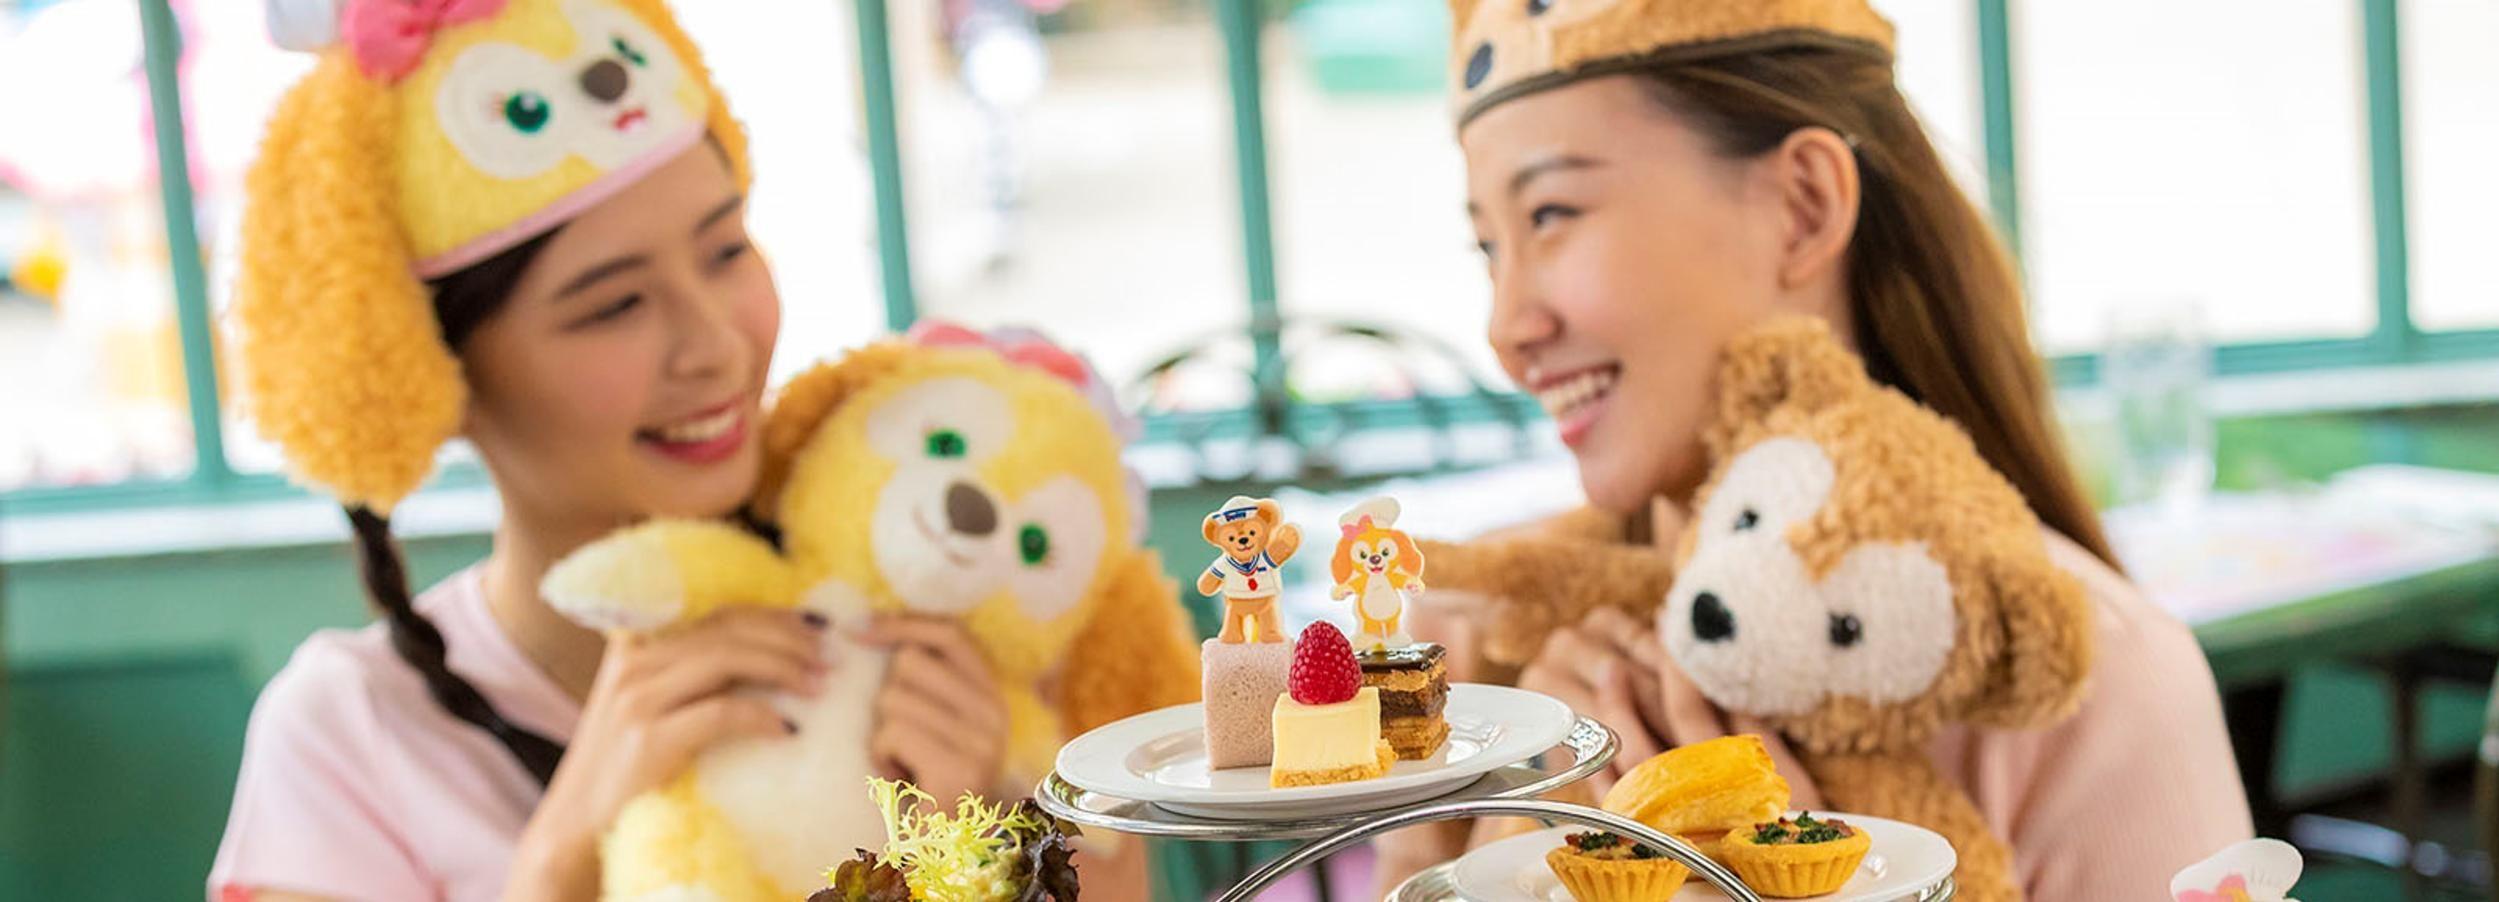 Hong Kong Disneyland: Chá da tarde para 2 no Corner Cafe